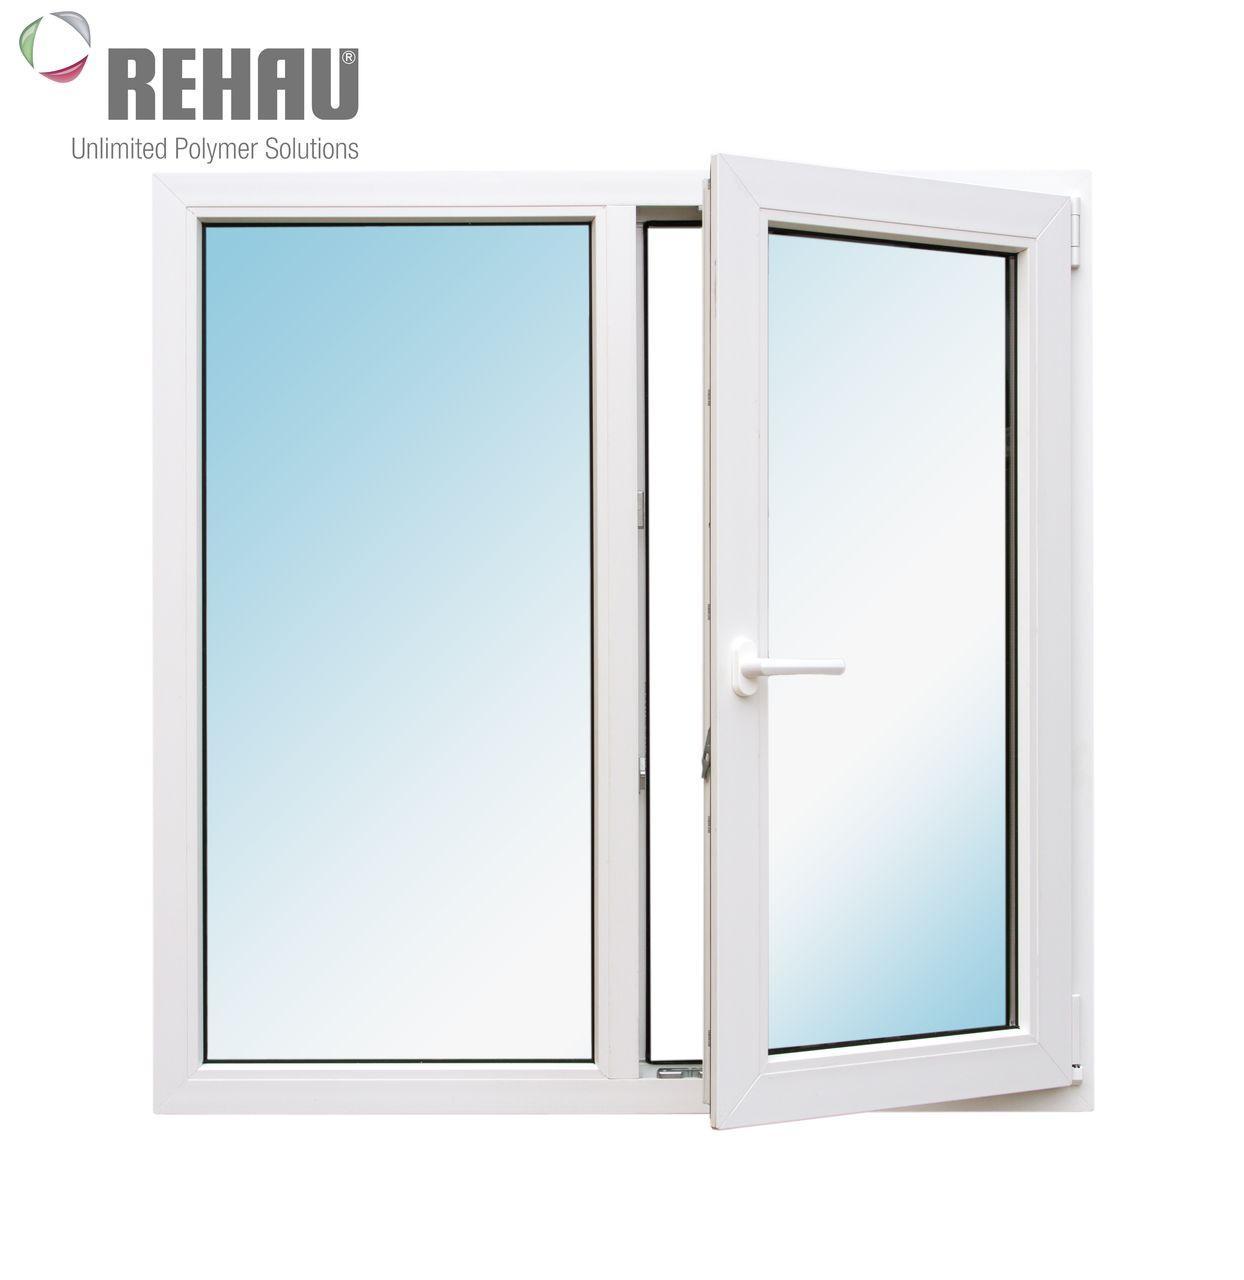 Окно металлопластиковое Rehau 1150 x 1350